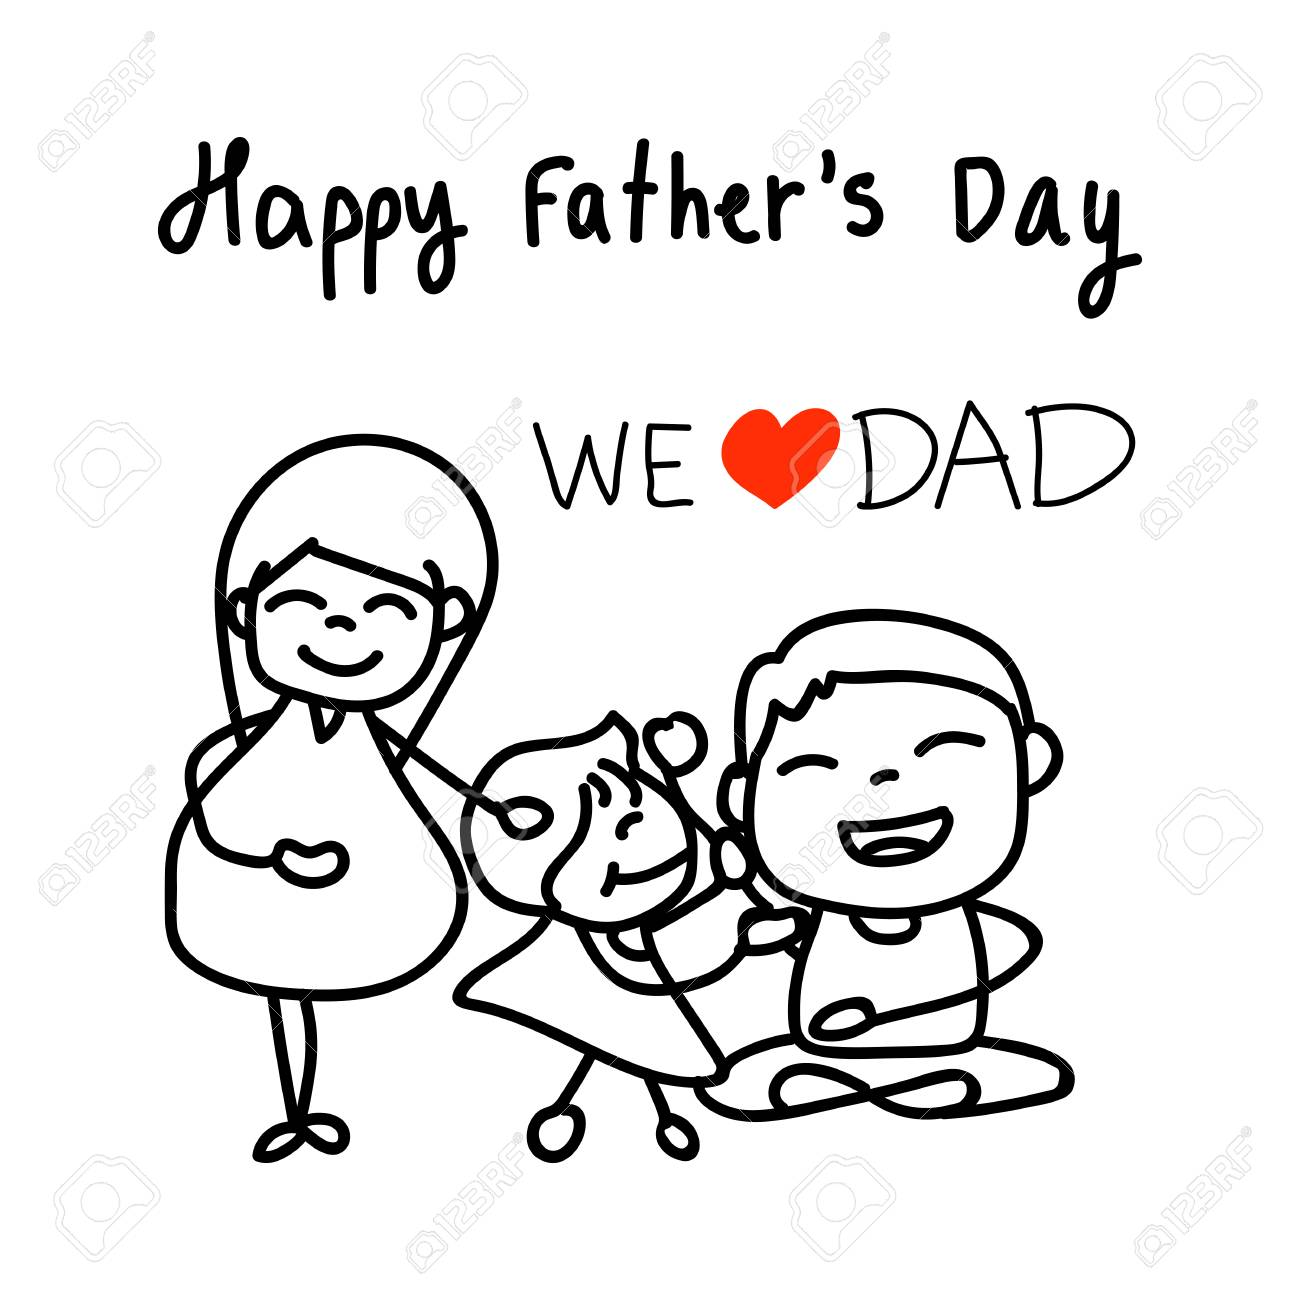 Mano Dibujo Personaje De Dibujos Animados Feliz Dia De Padres